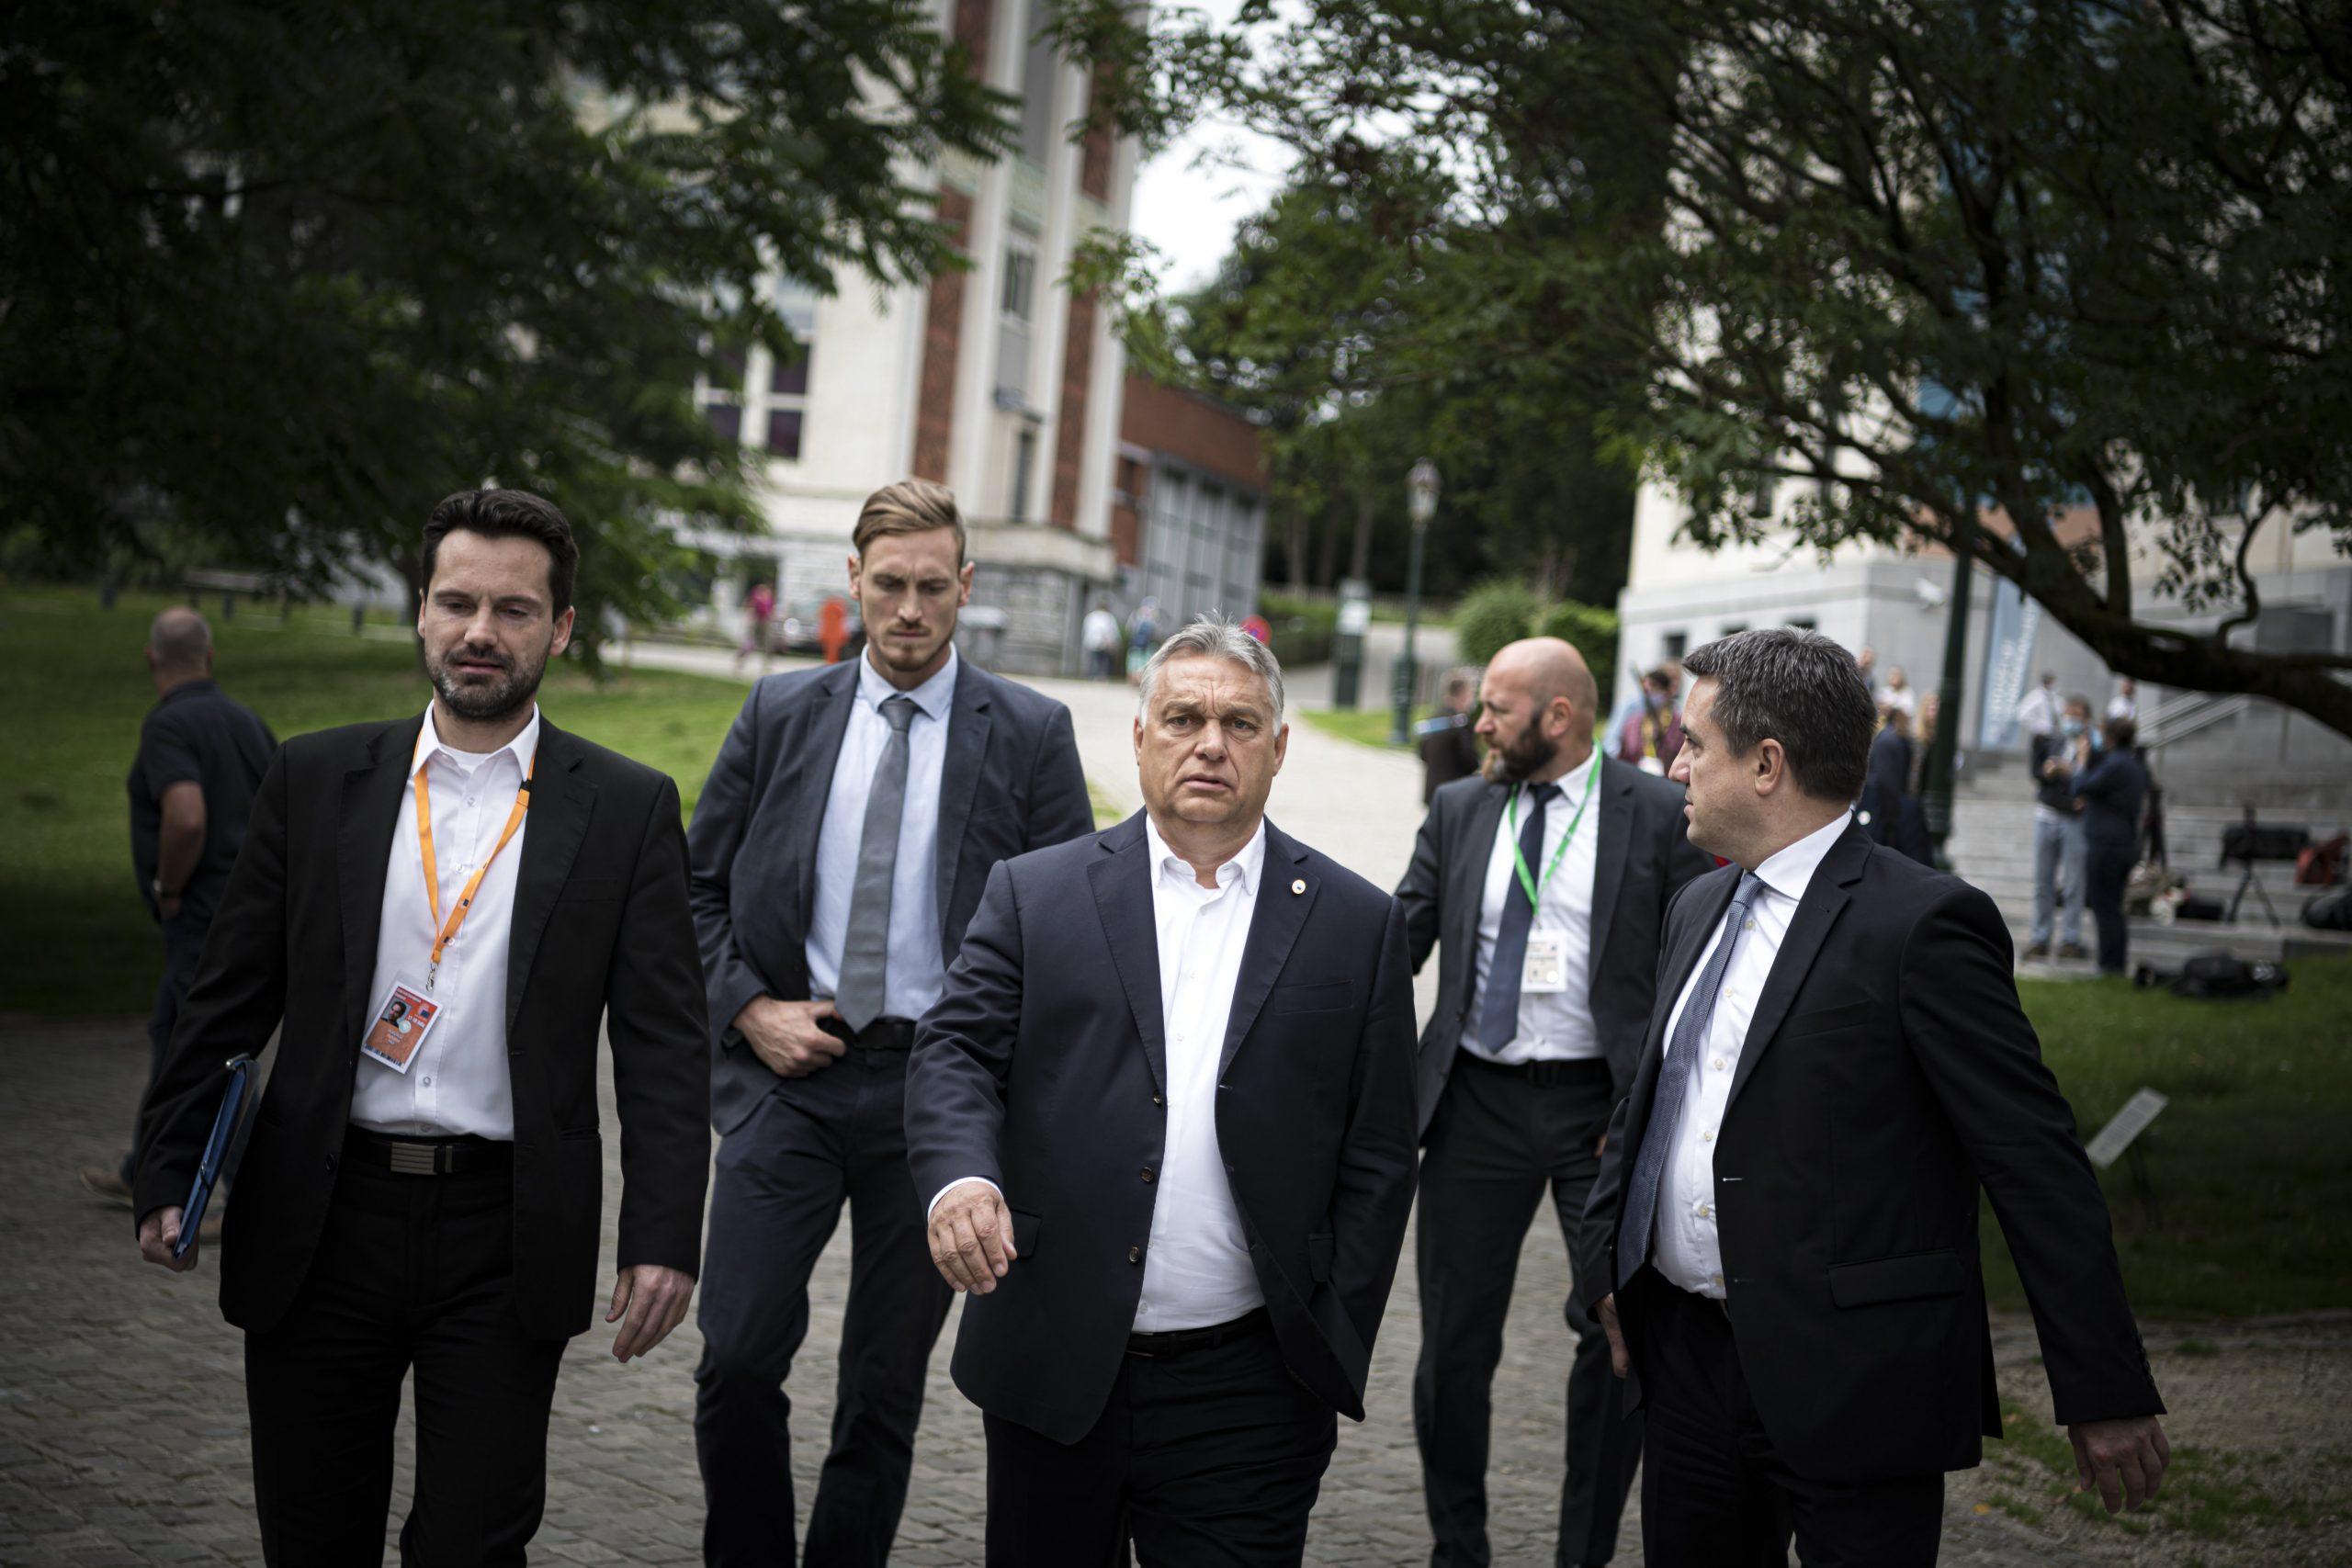 Fidesz: EU Summit Hungary's 'Financial, Moral Victory'